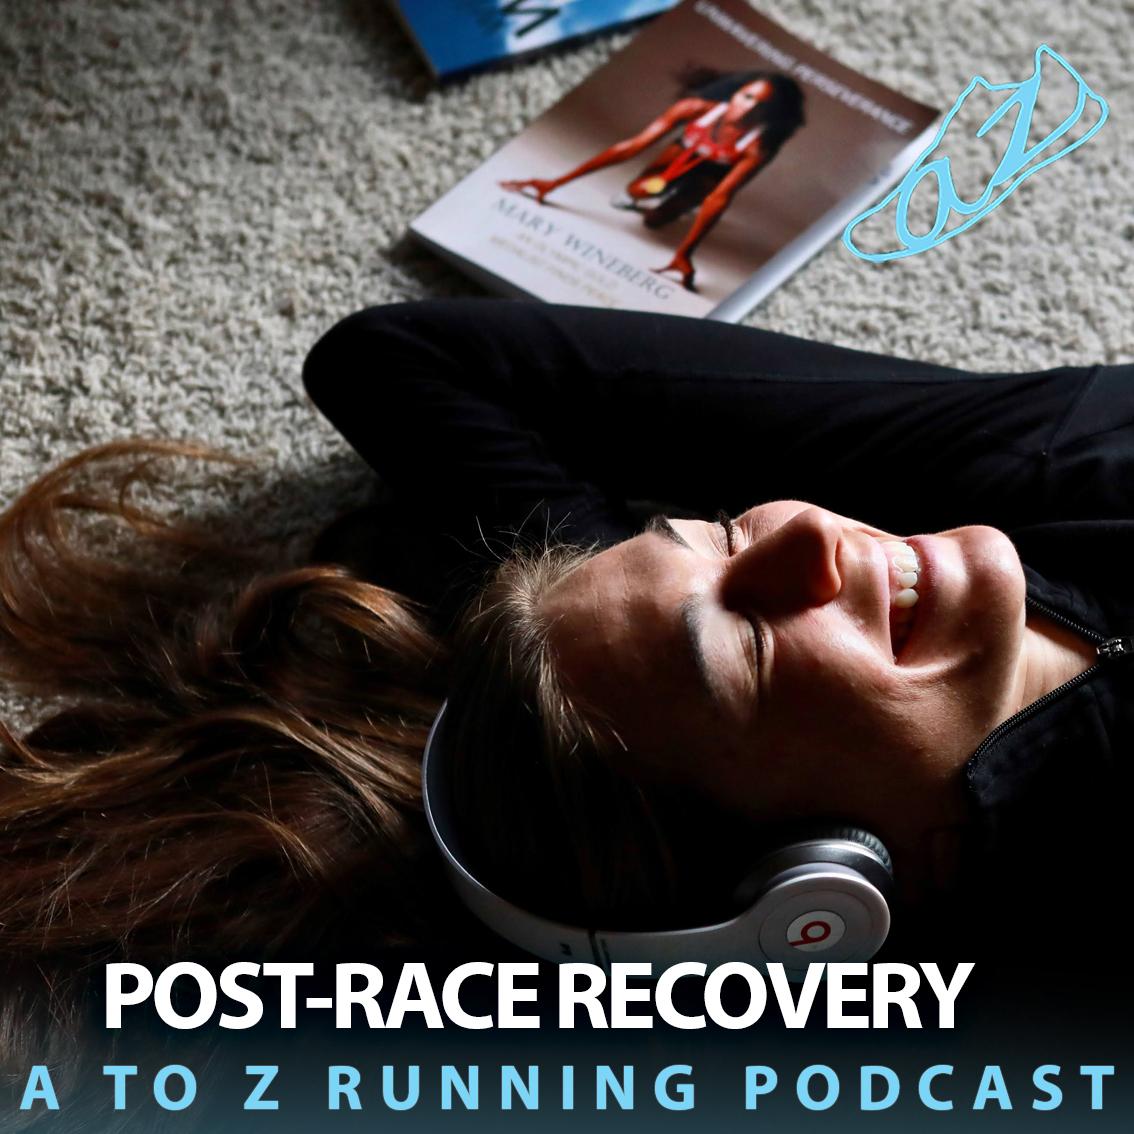 post-marathon recovery